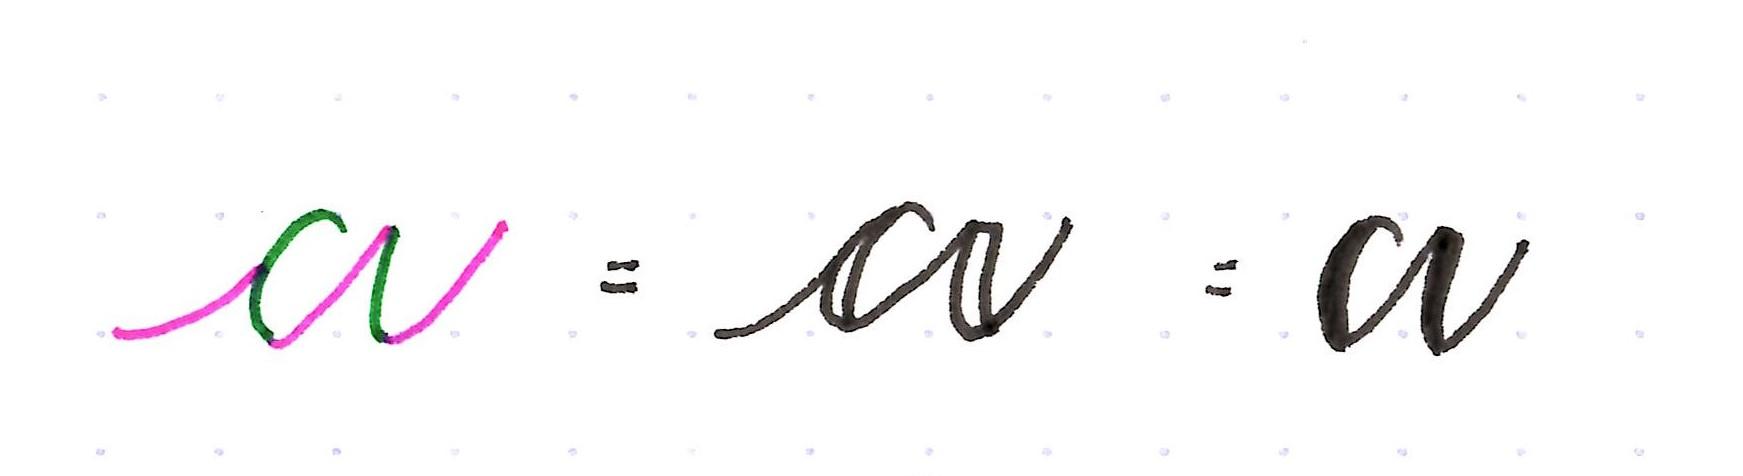 basics a.JPG